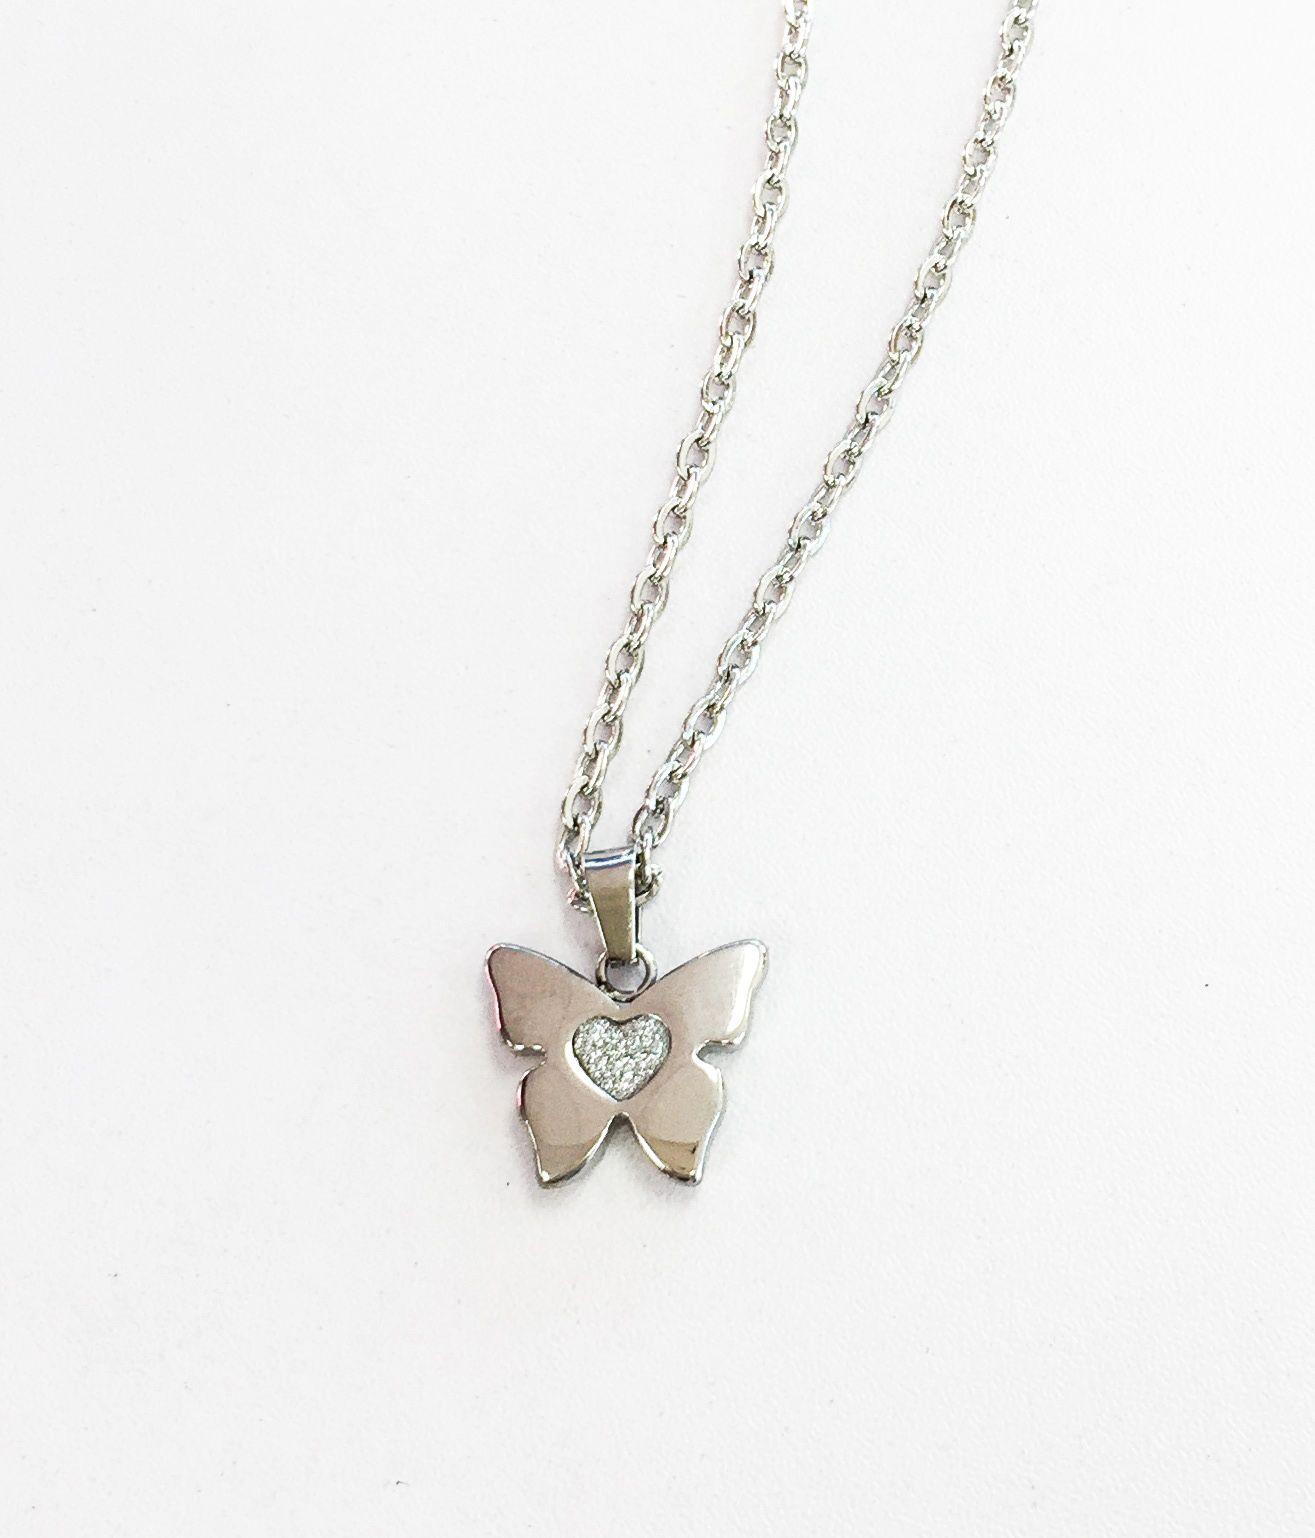 1ac3aa492dcd Dije mariposa y cadena acero inoxidable - Creaciones Cadena Acero  Inoxidable